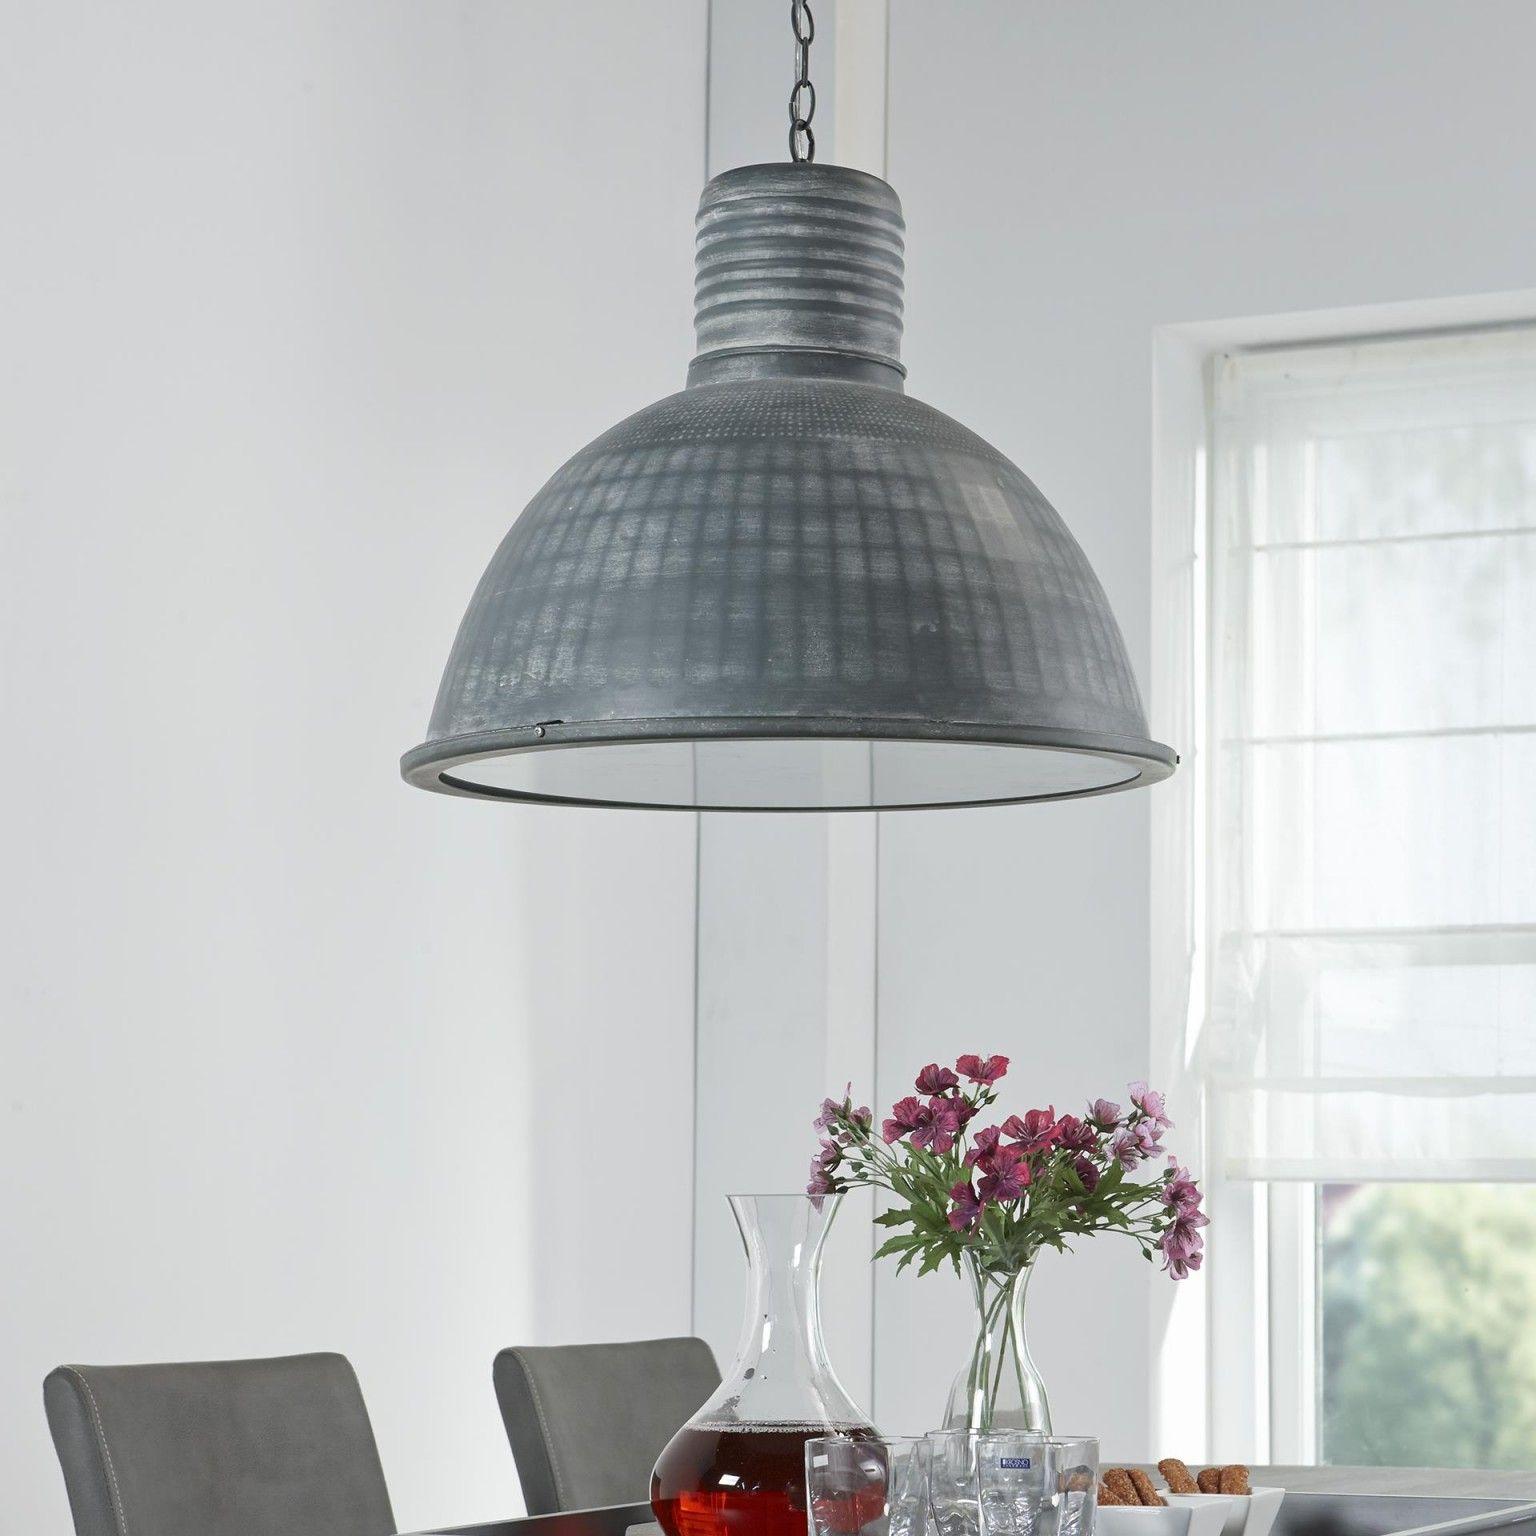 Industrile Hanglamp Constance 52cm kleur grijs